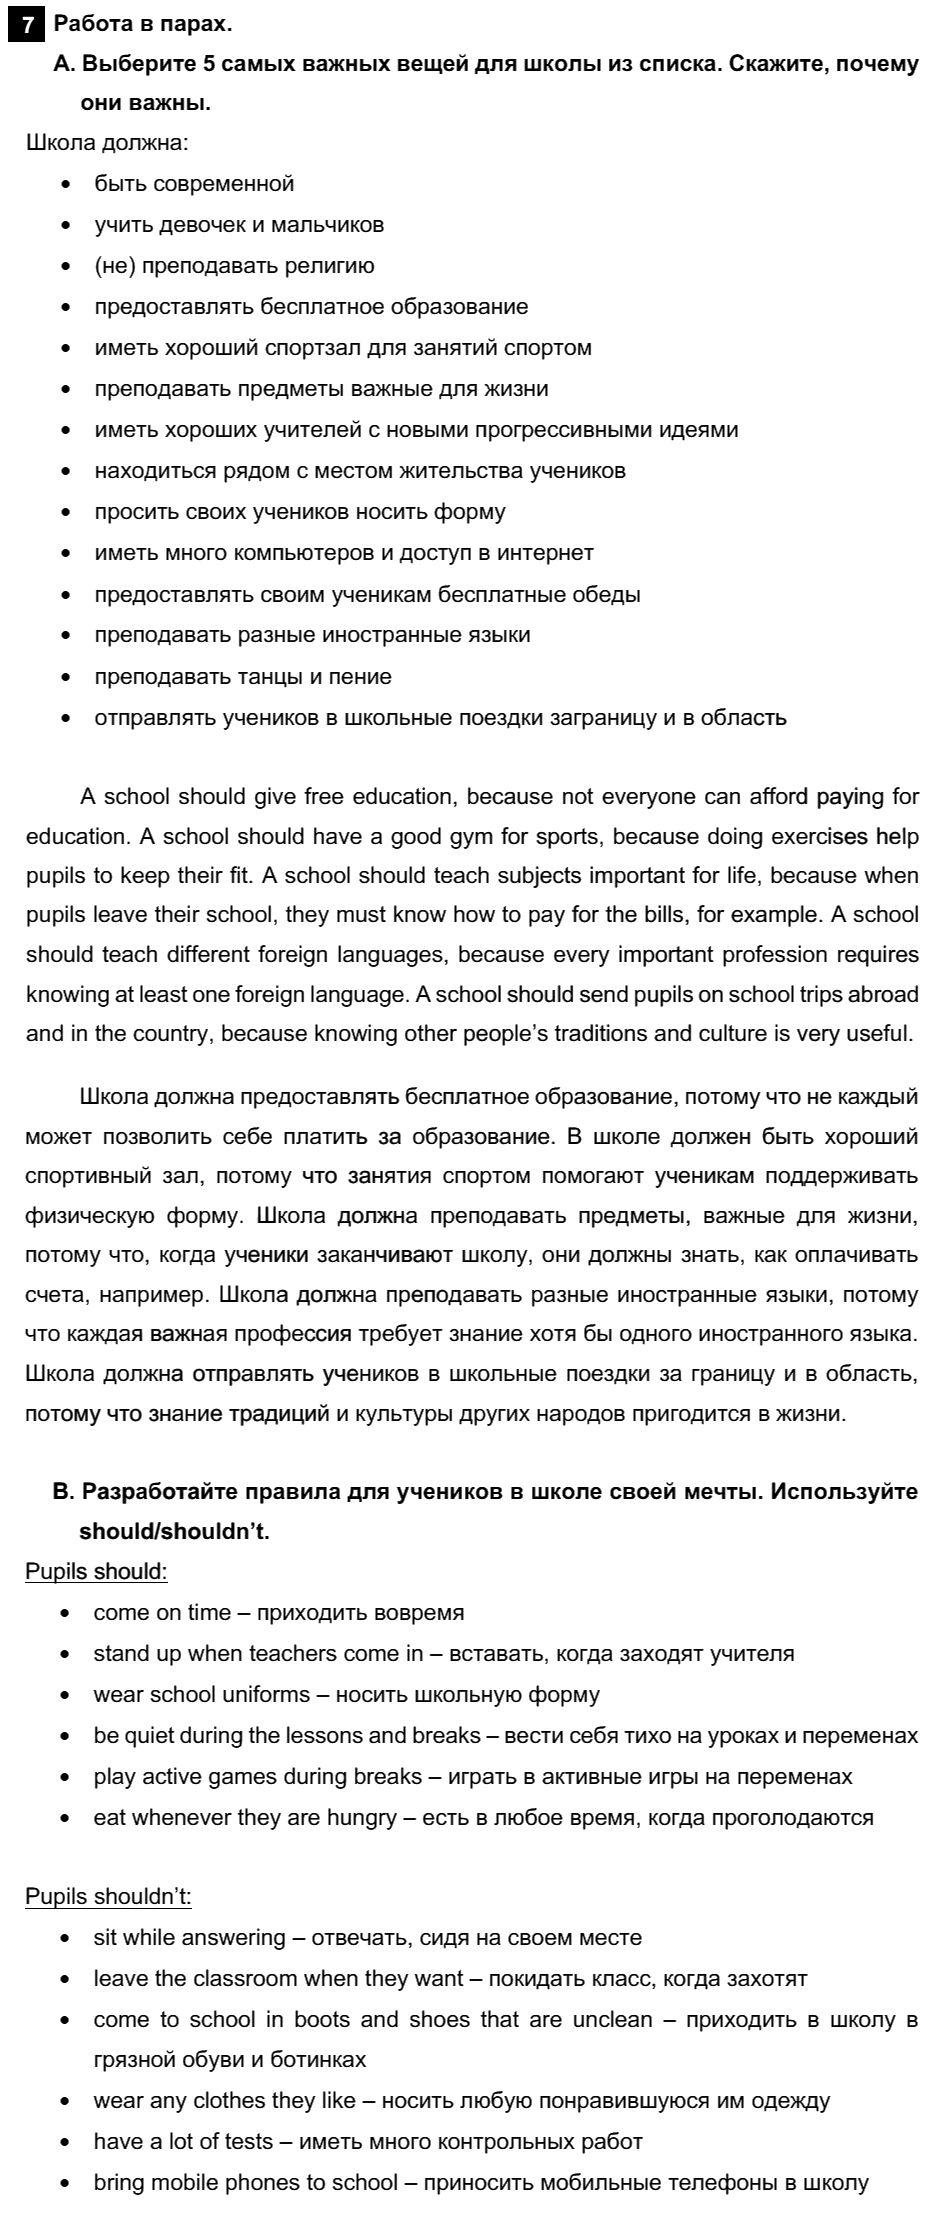 Английский язык 7 класс Афанасьева О. В. Unit 1. Школа и учёба / Шаг 8: 7